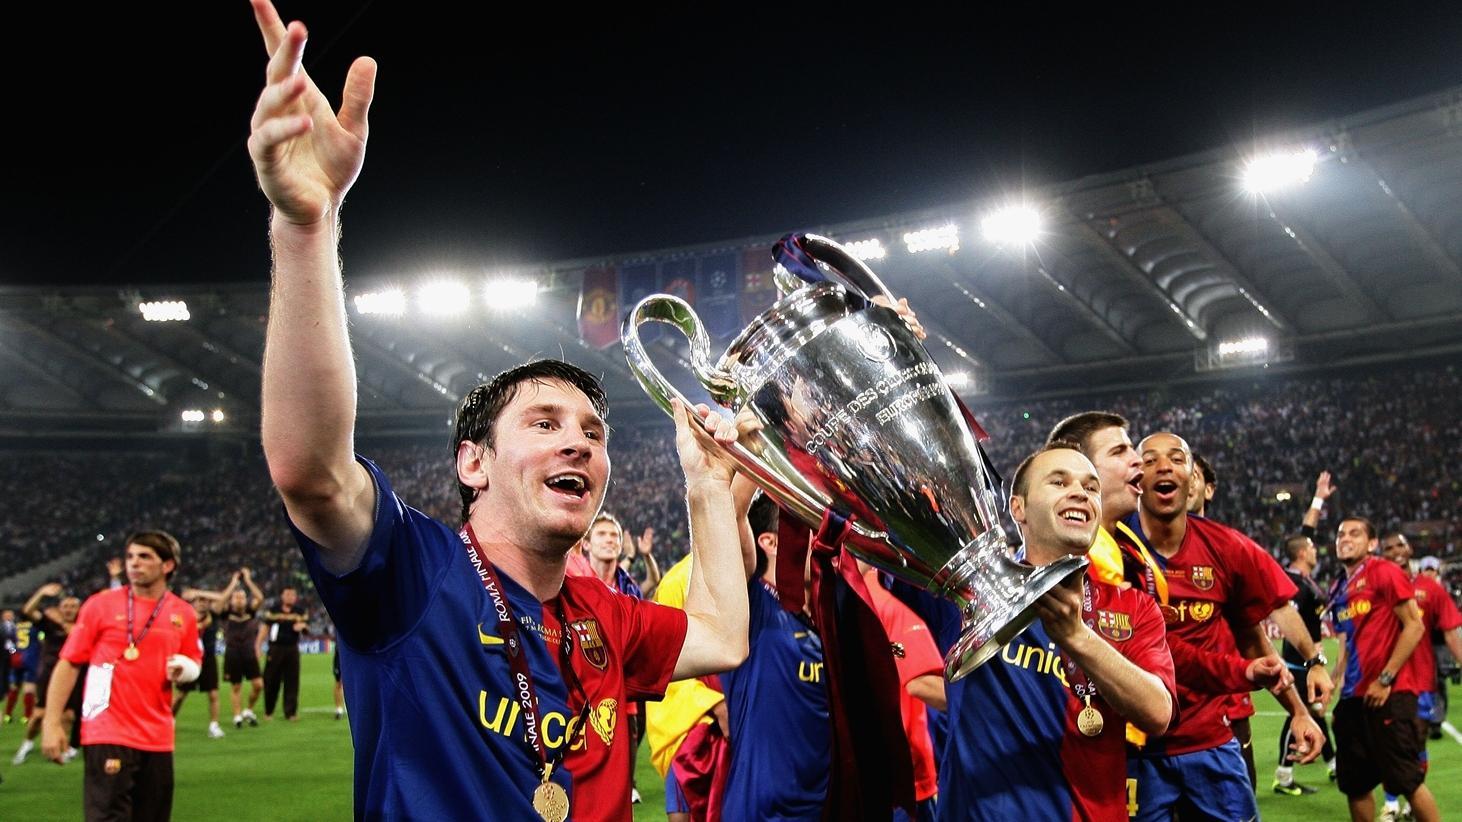 messi leads barca to rome glory uefa champions league uefa com messi leads barca to rome glory uefa